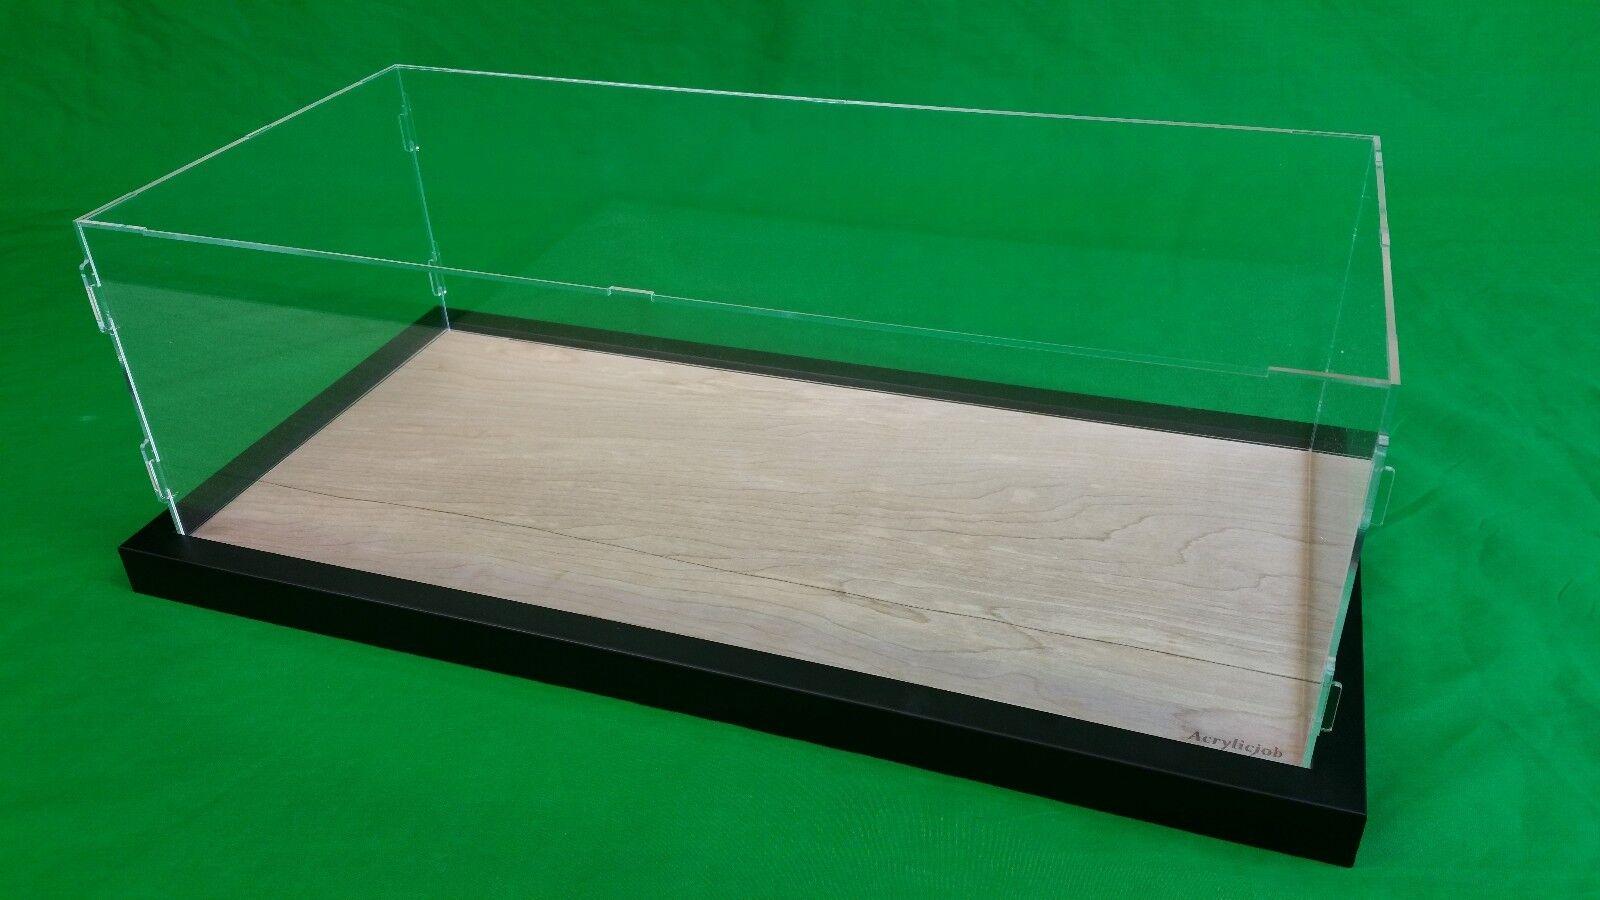 22 x 9 3 4 x 7 Pocher Acrylic Display Case Showcase w Wood Base for 1 8 Model